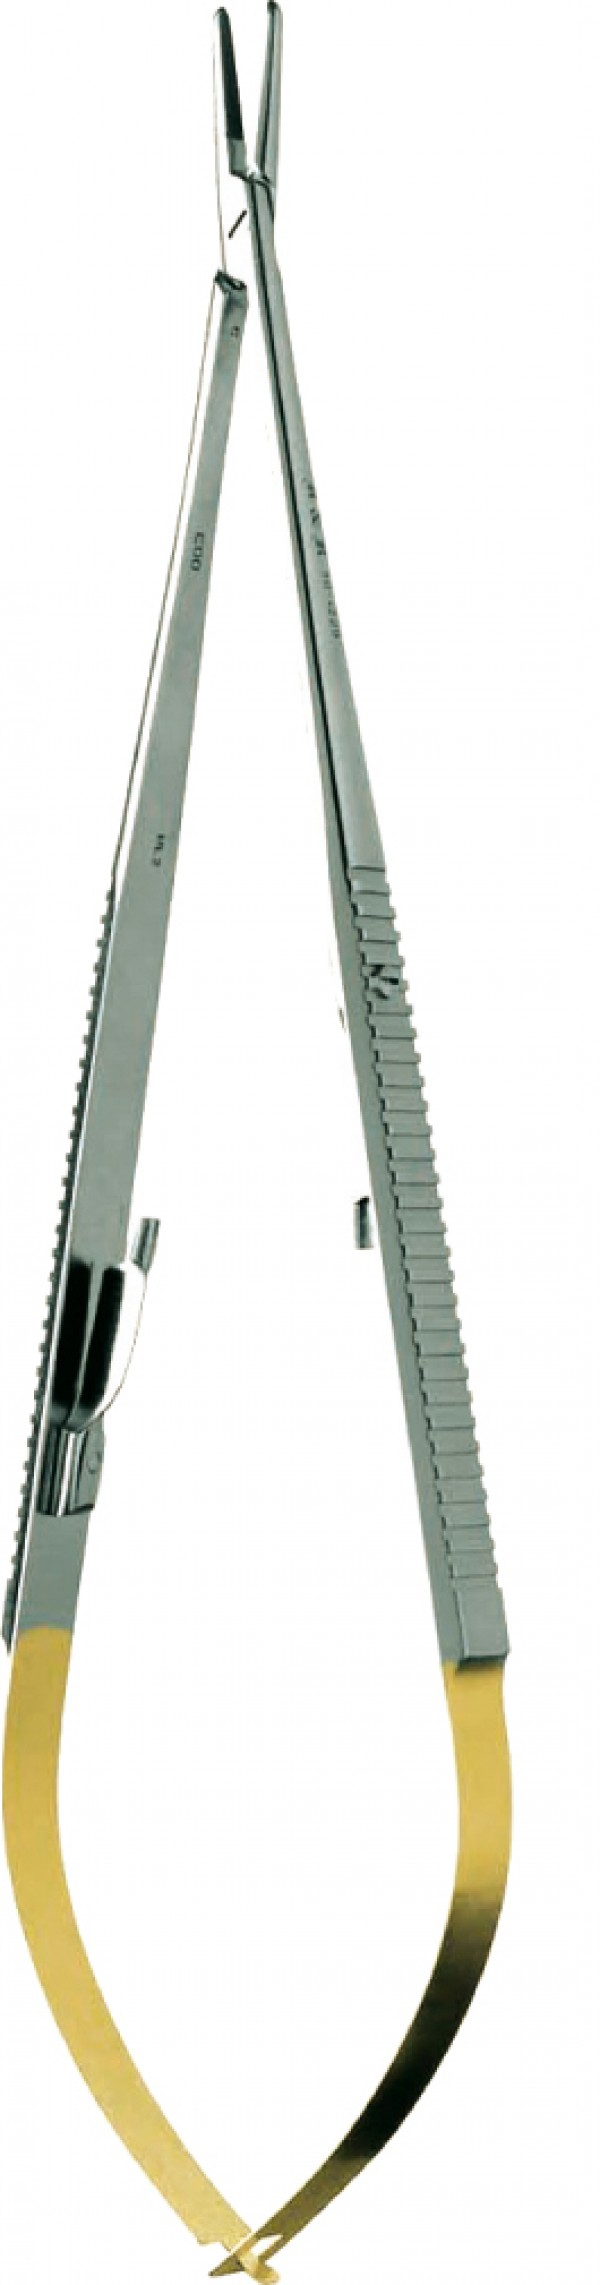 "TC Castroviejo 5.52"" , straight, flat handle"